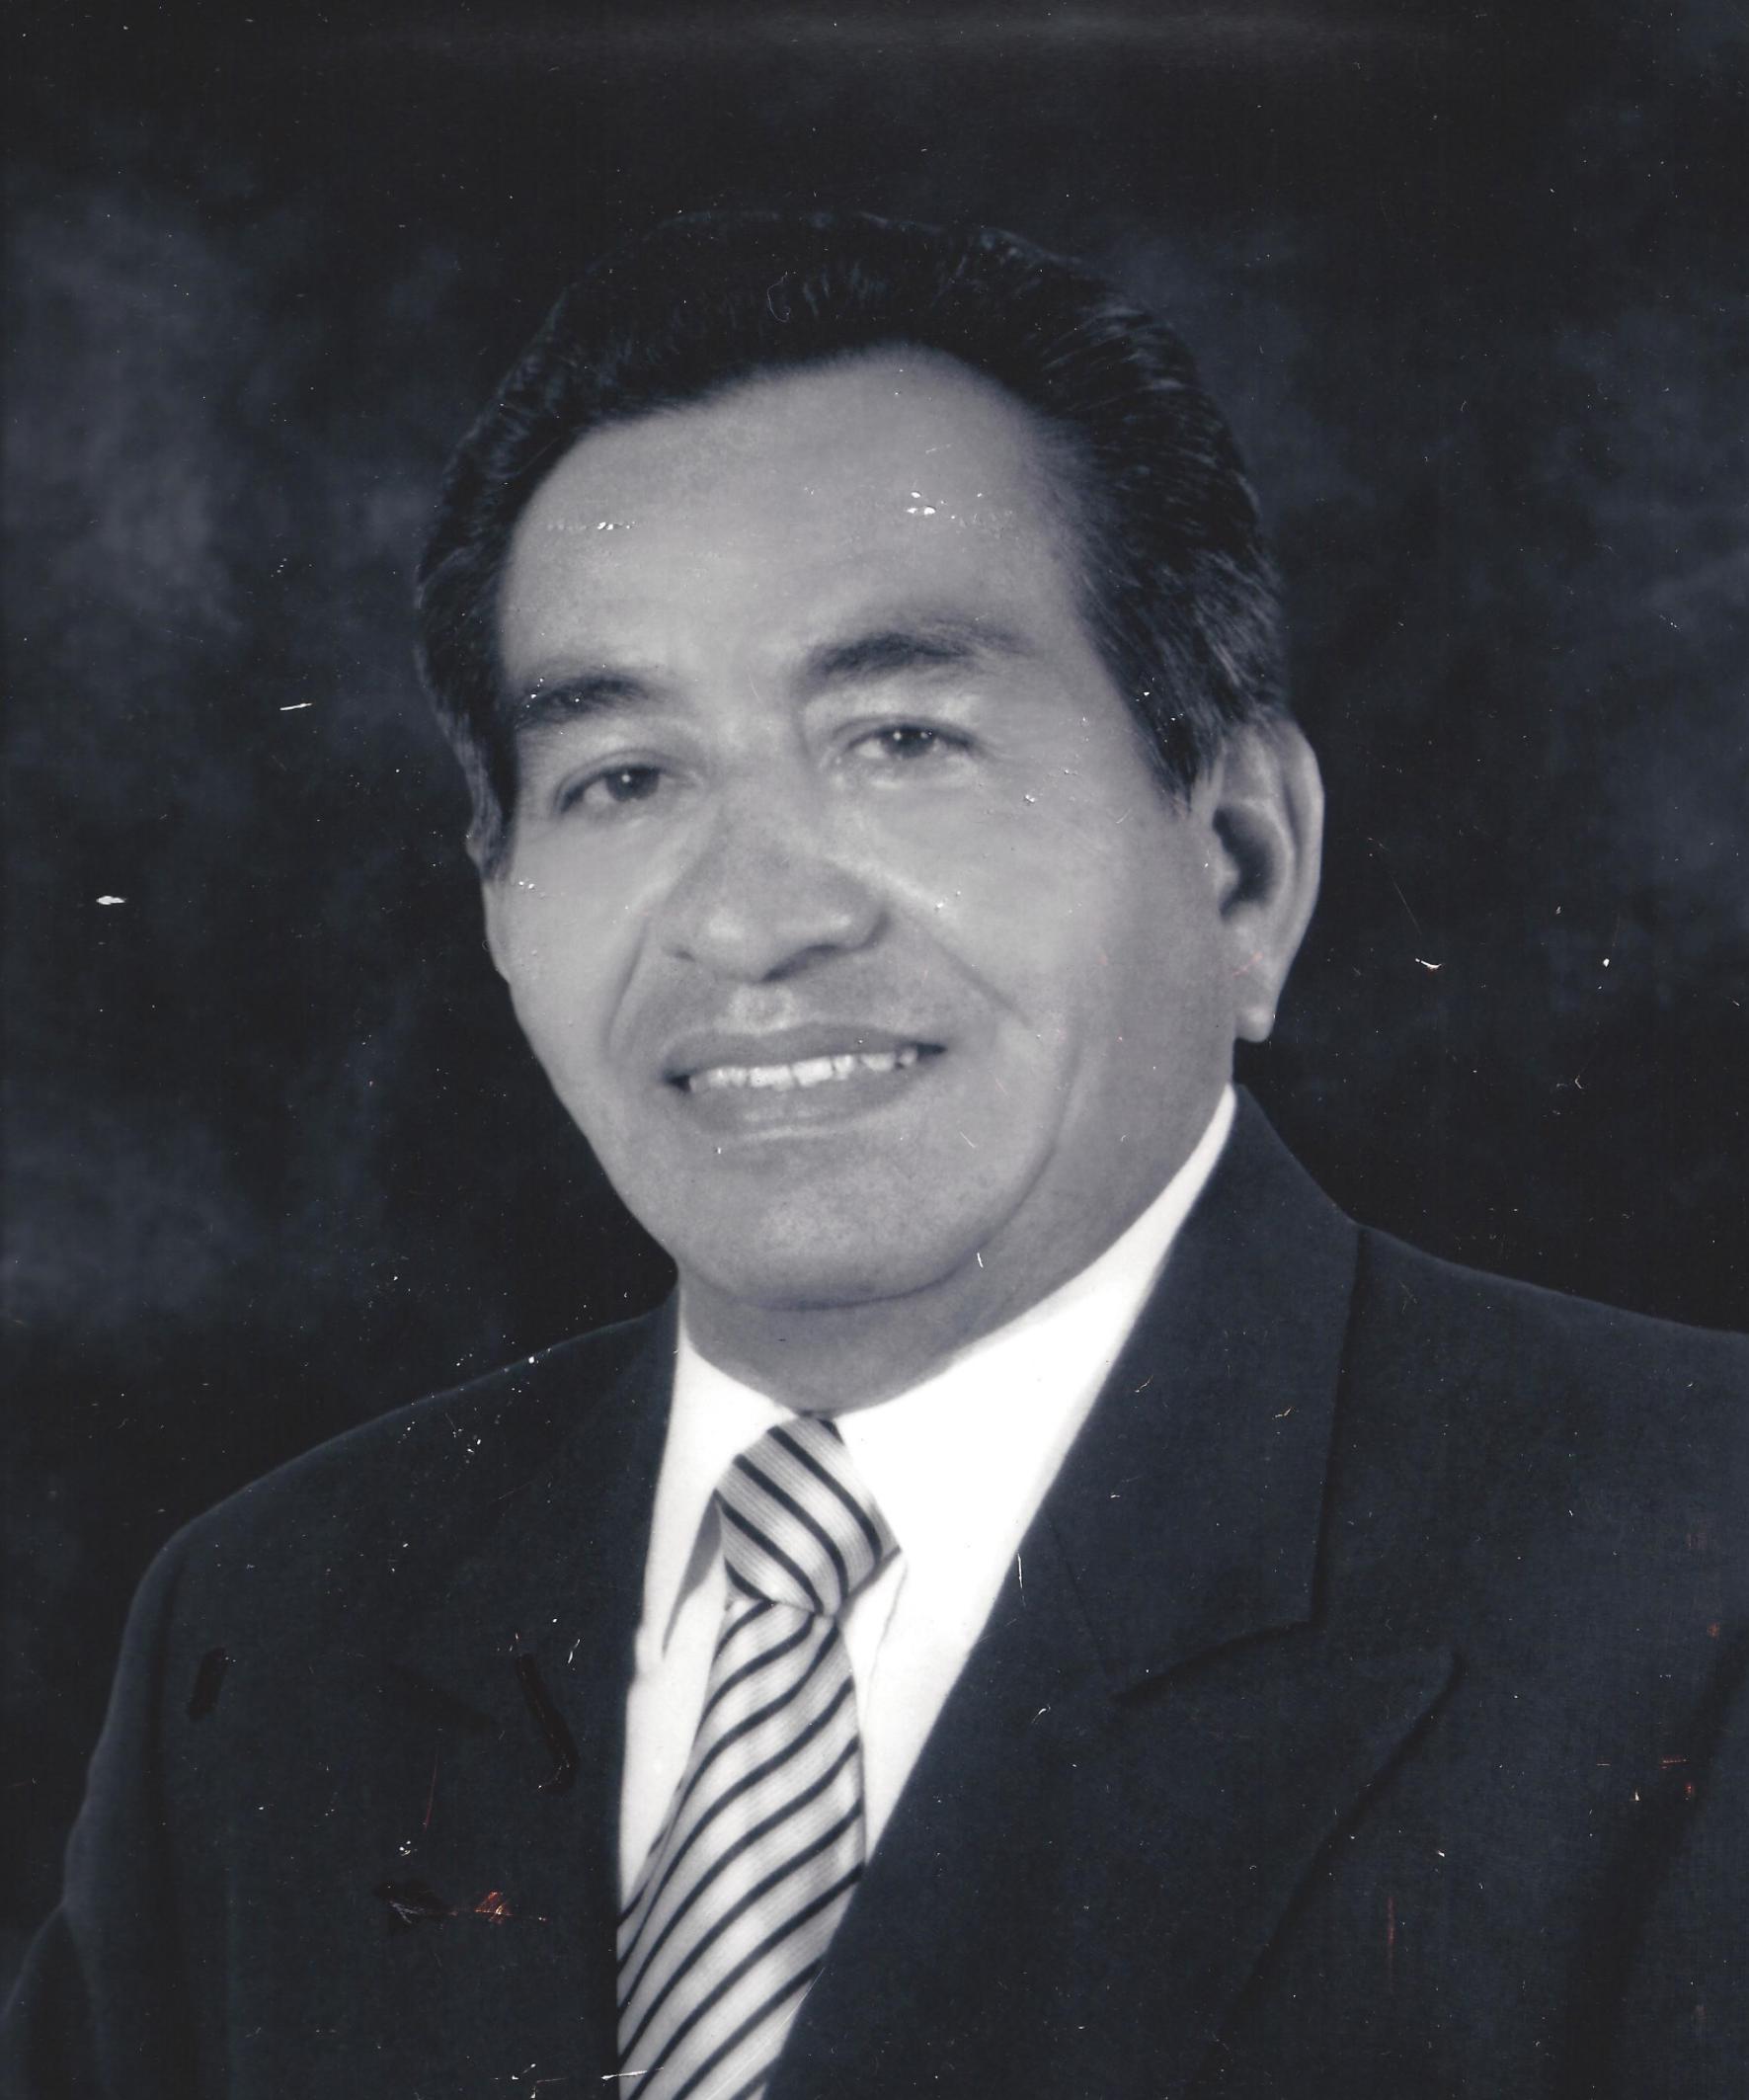 C.P. VÍCTOR HERNÁNDEZ ALCARAZ